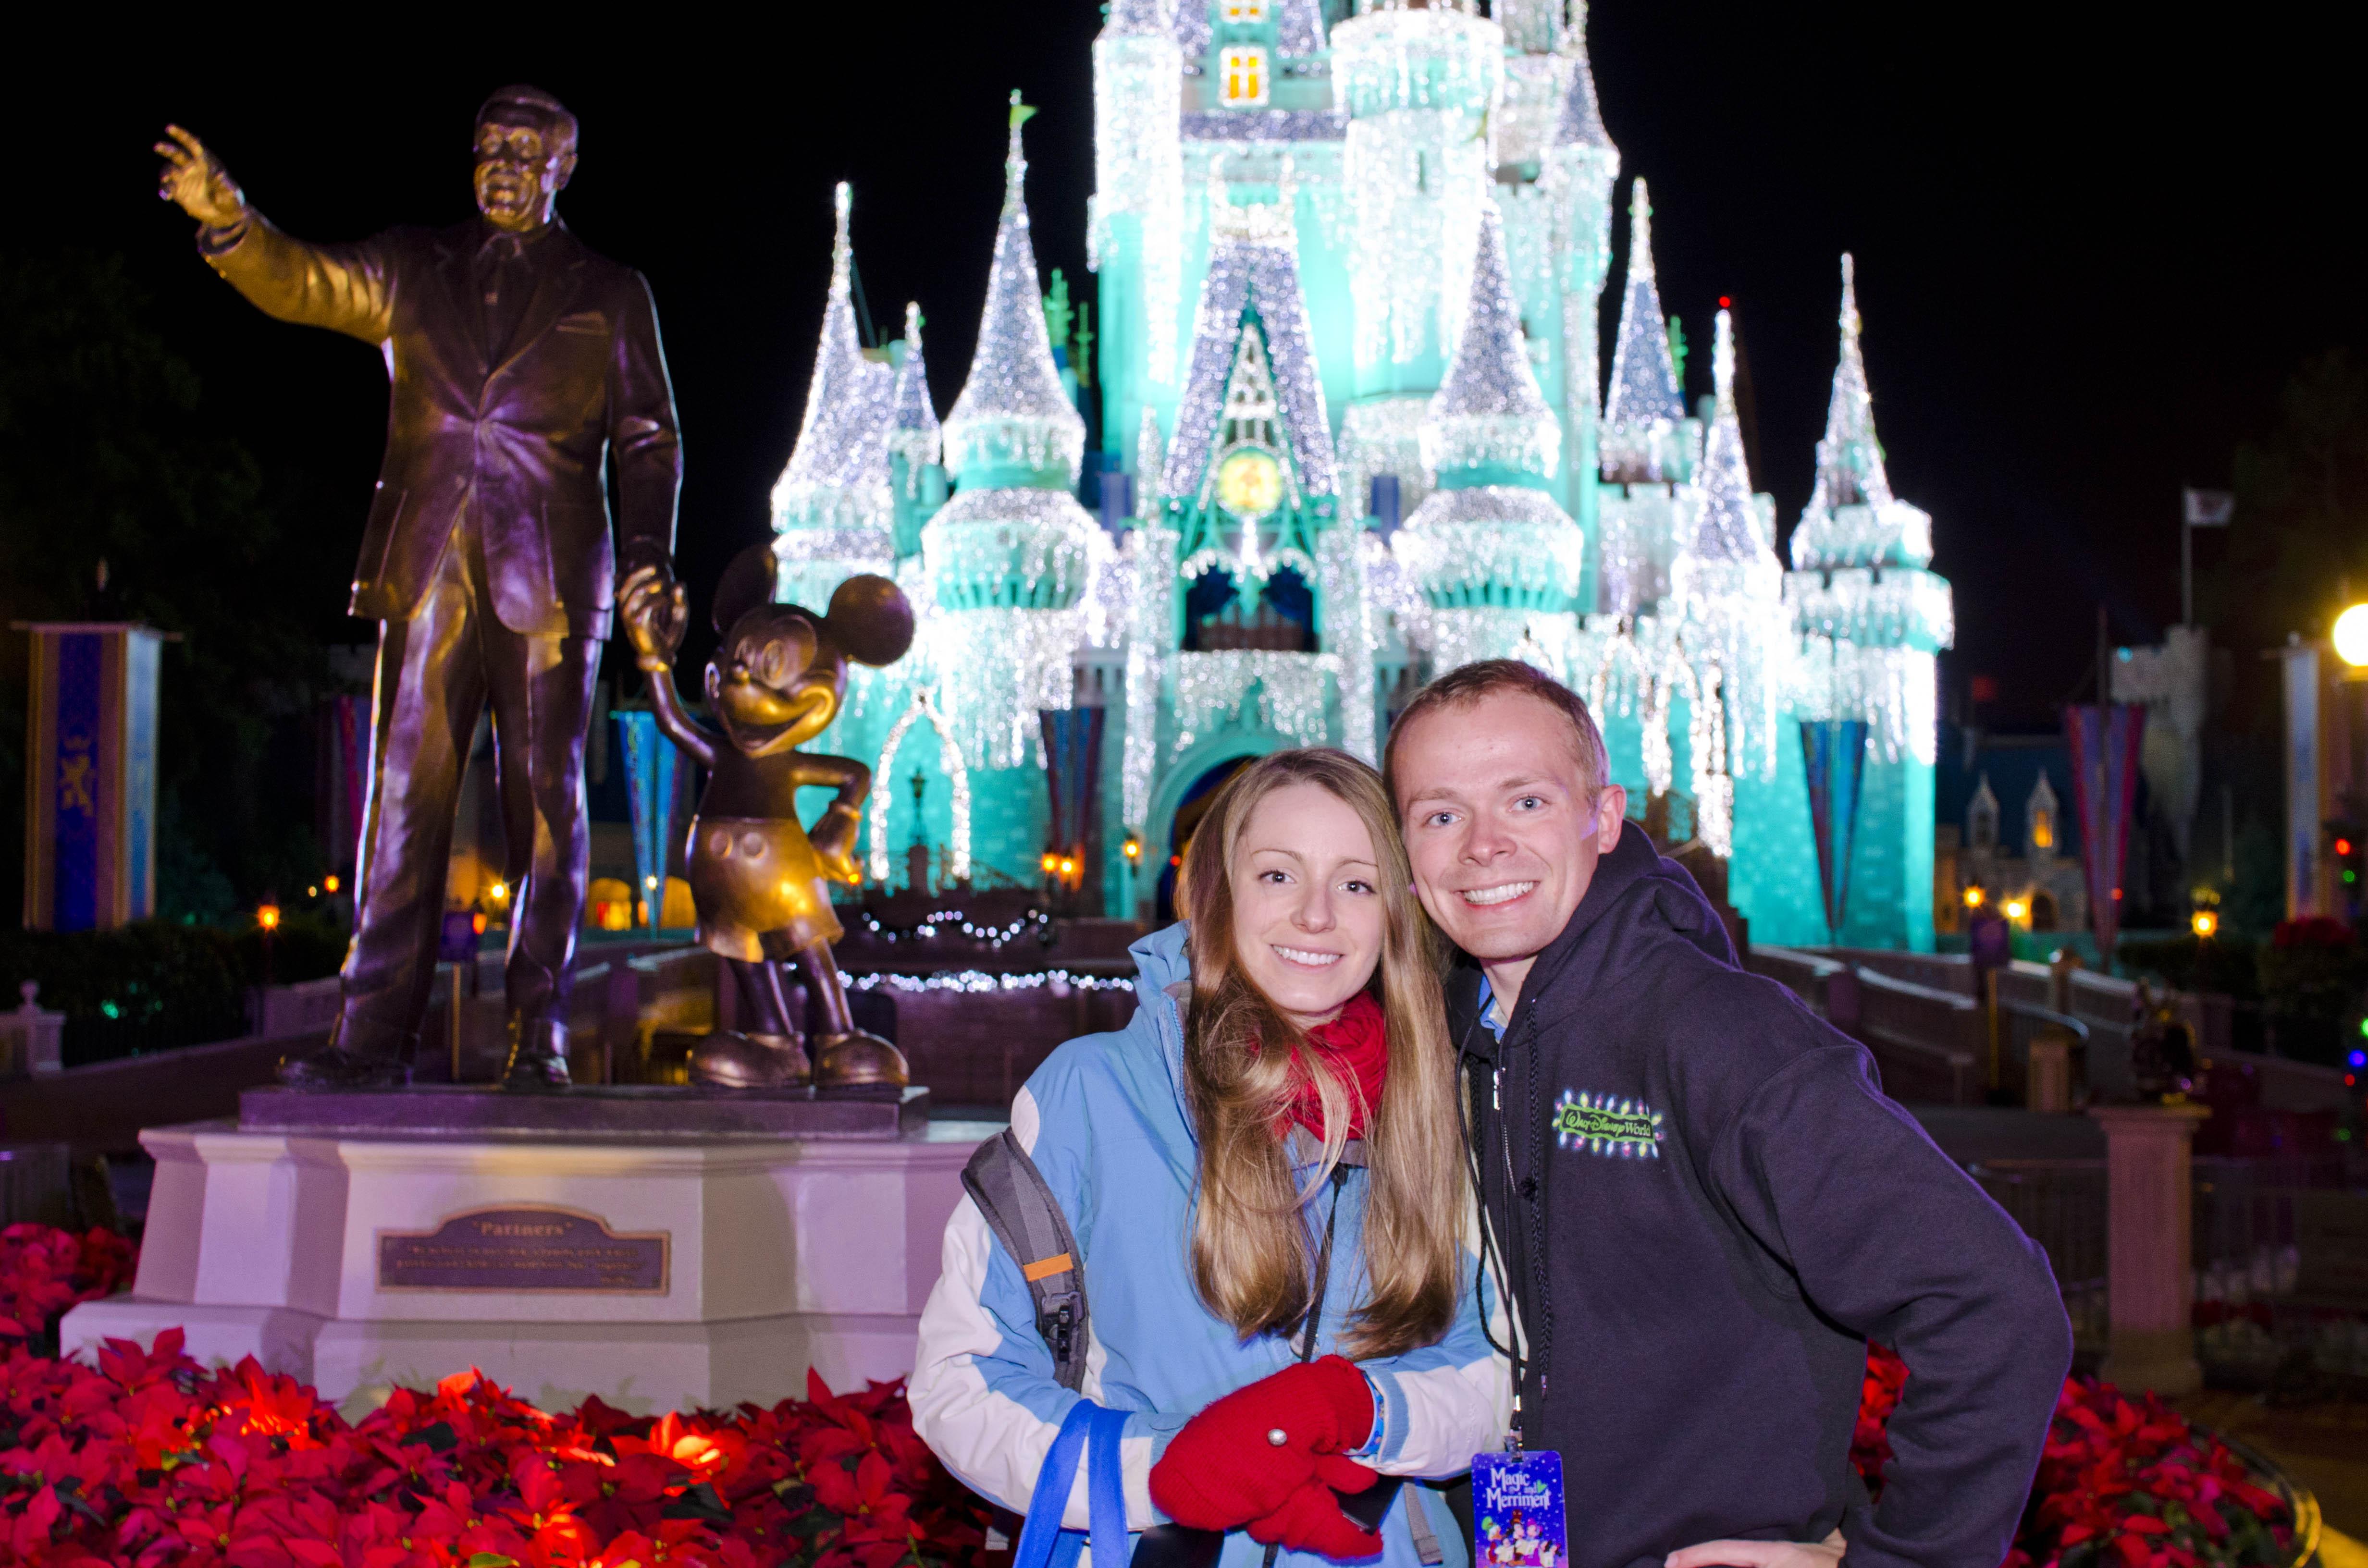 Disney World Christmas Card Photo Locations - Disney Tourist Blog